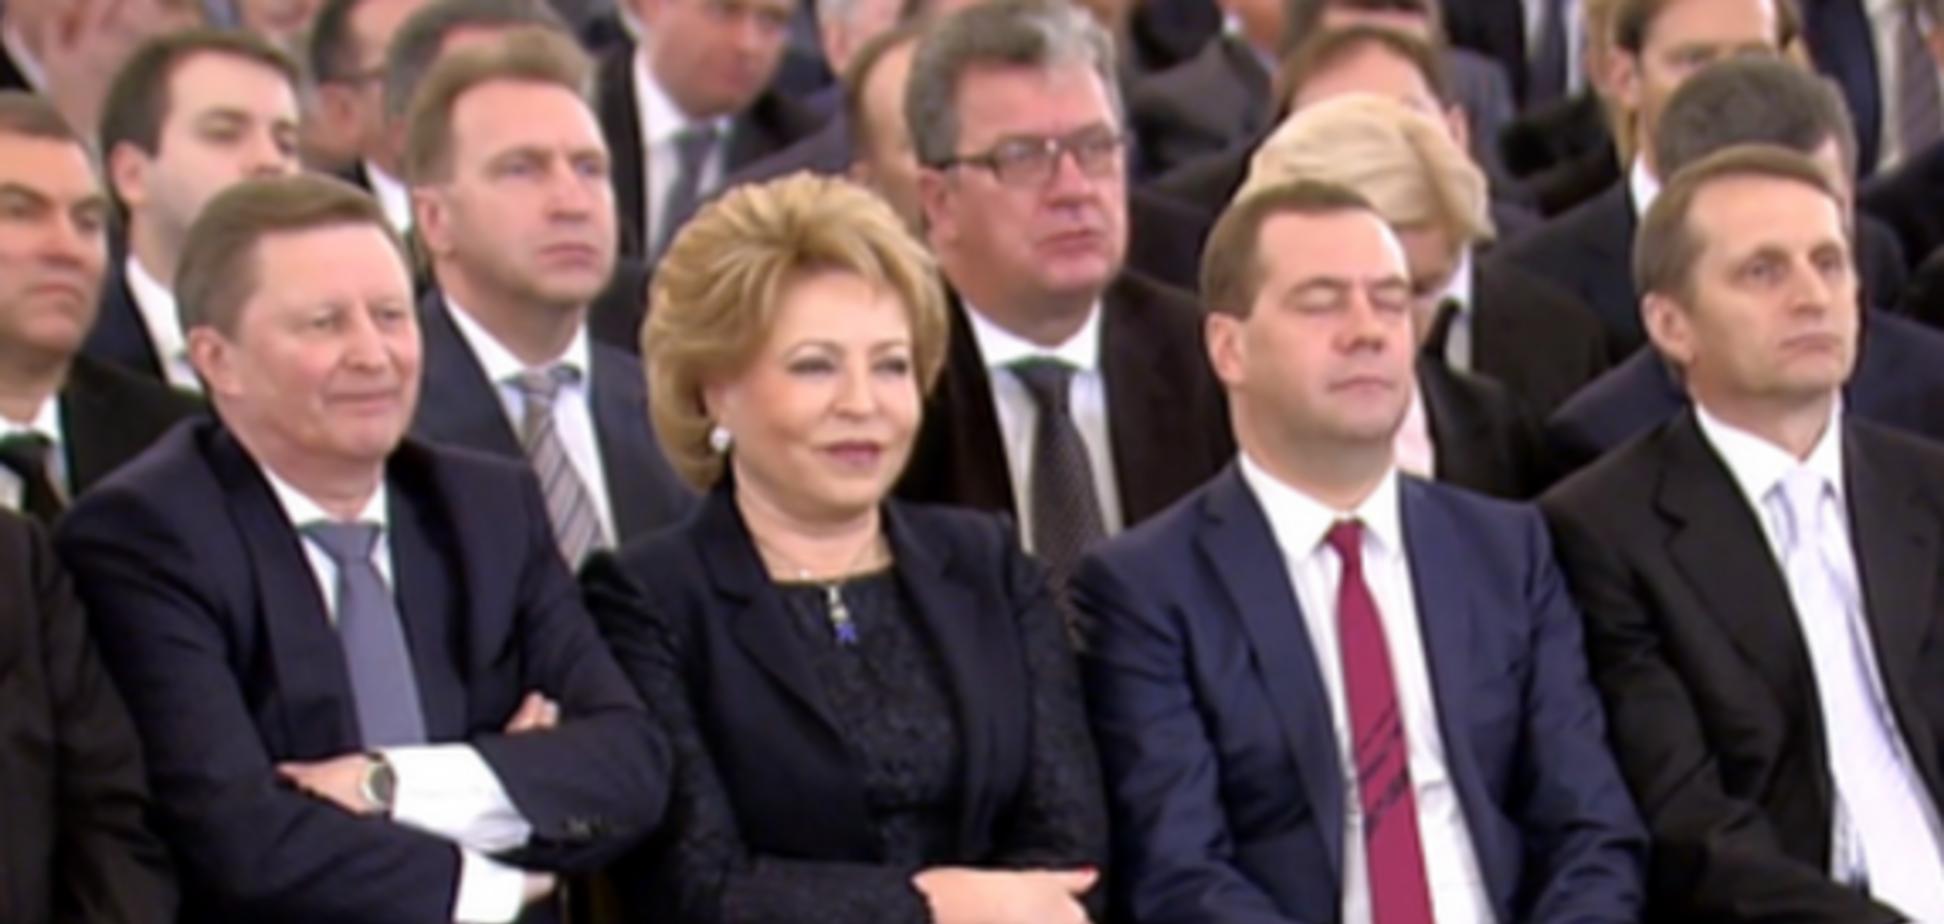 Медведева не впечатлило послание Путина, он снова уснул: фотофакт